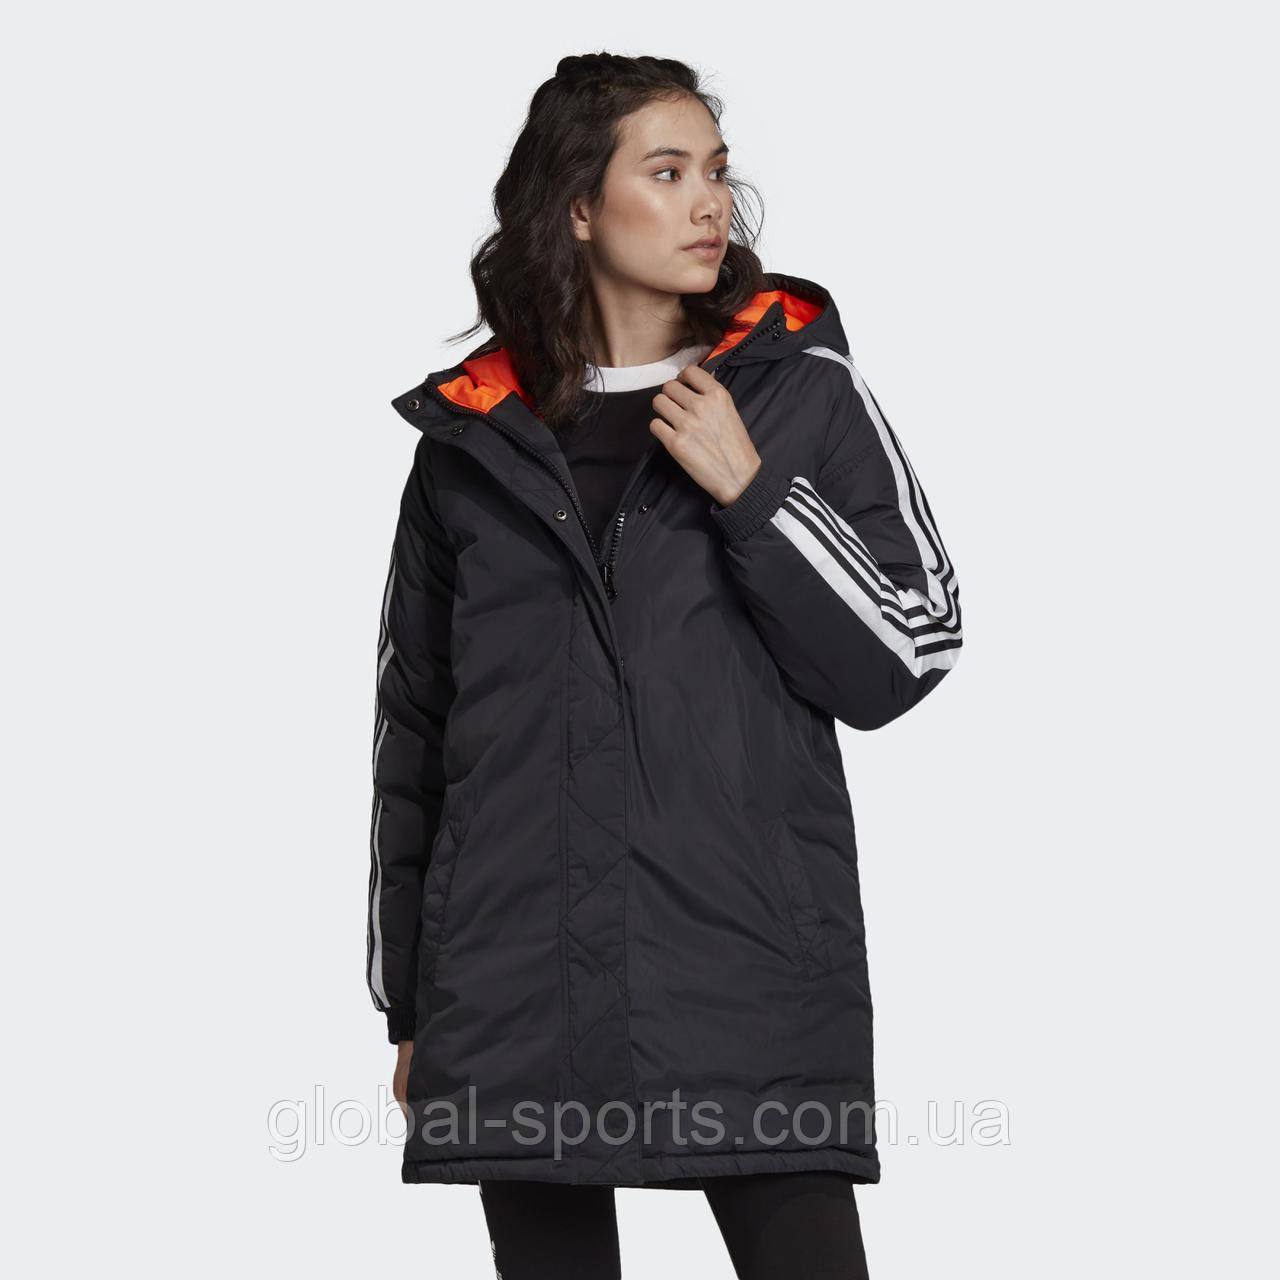 Жіноча куртка Adidas Adicolor Long W(Артикул:ED7585)